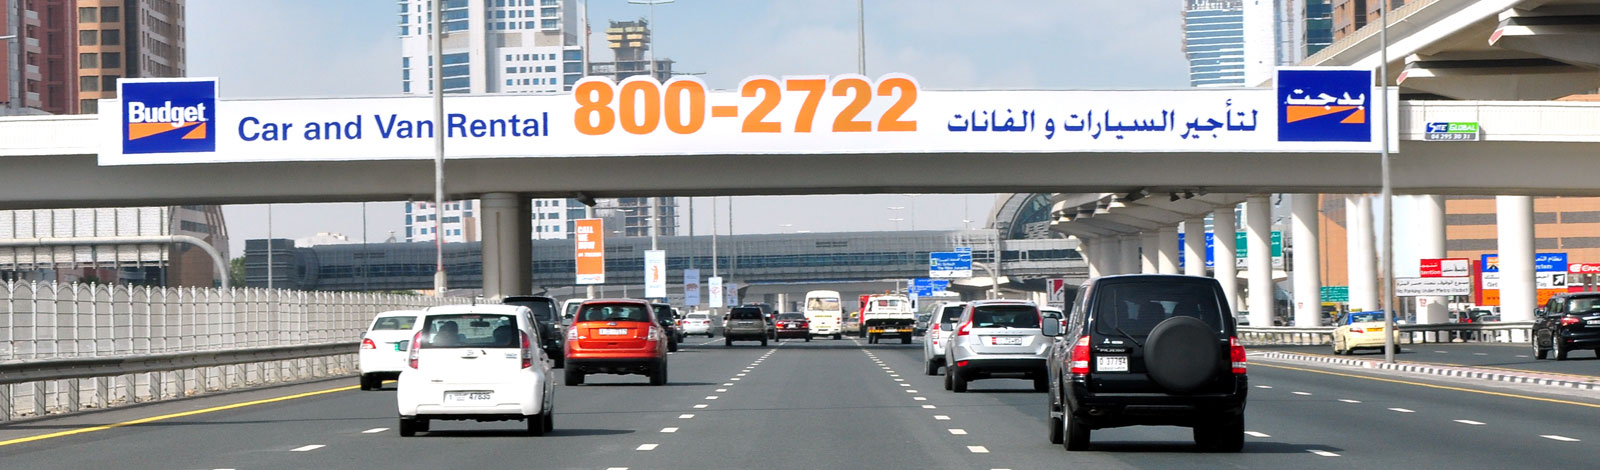 Site Global Bridge Banner Advertising